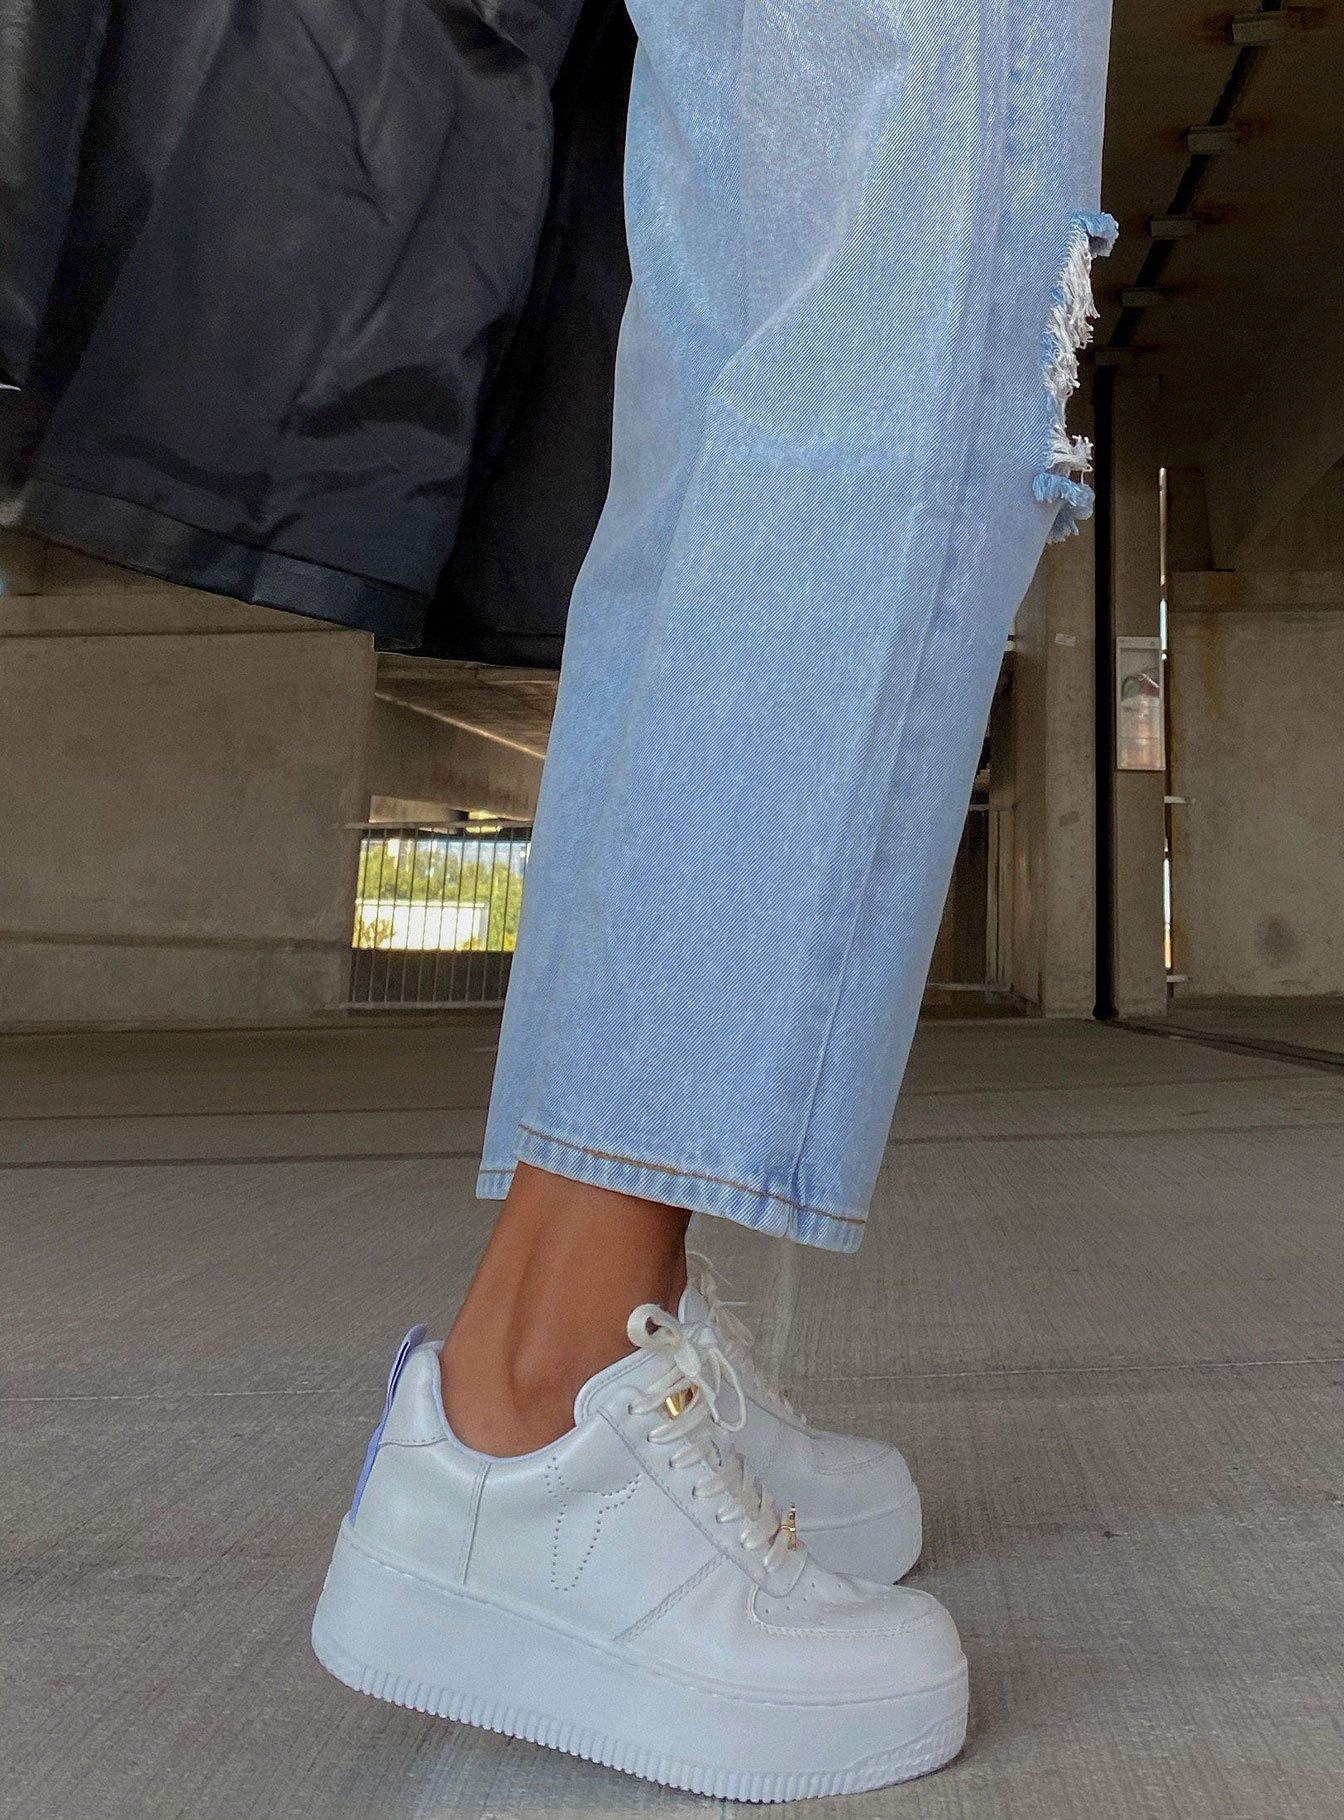 Sneakers (Side B)